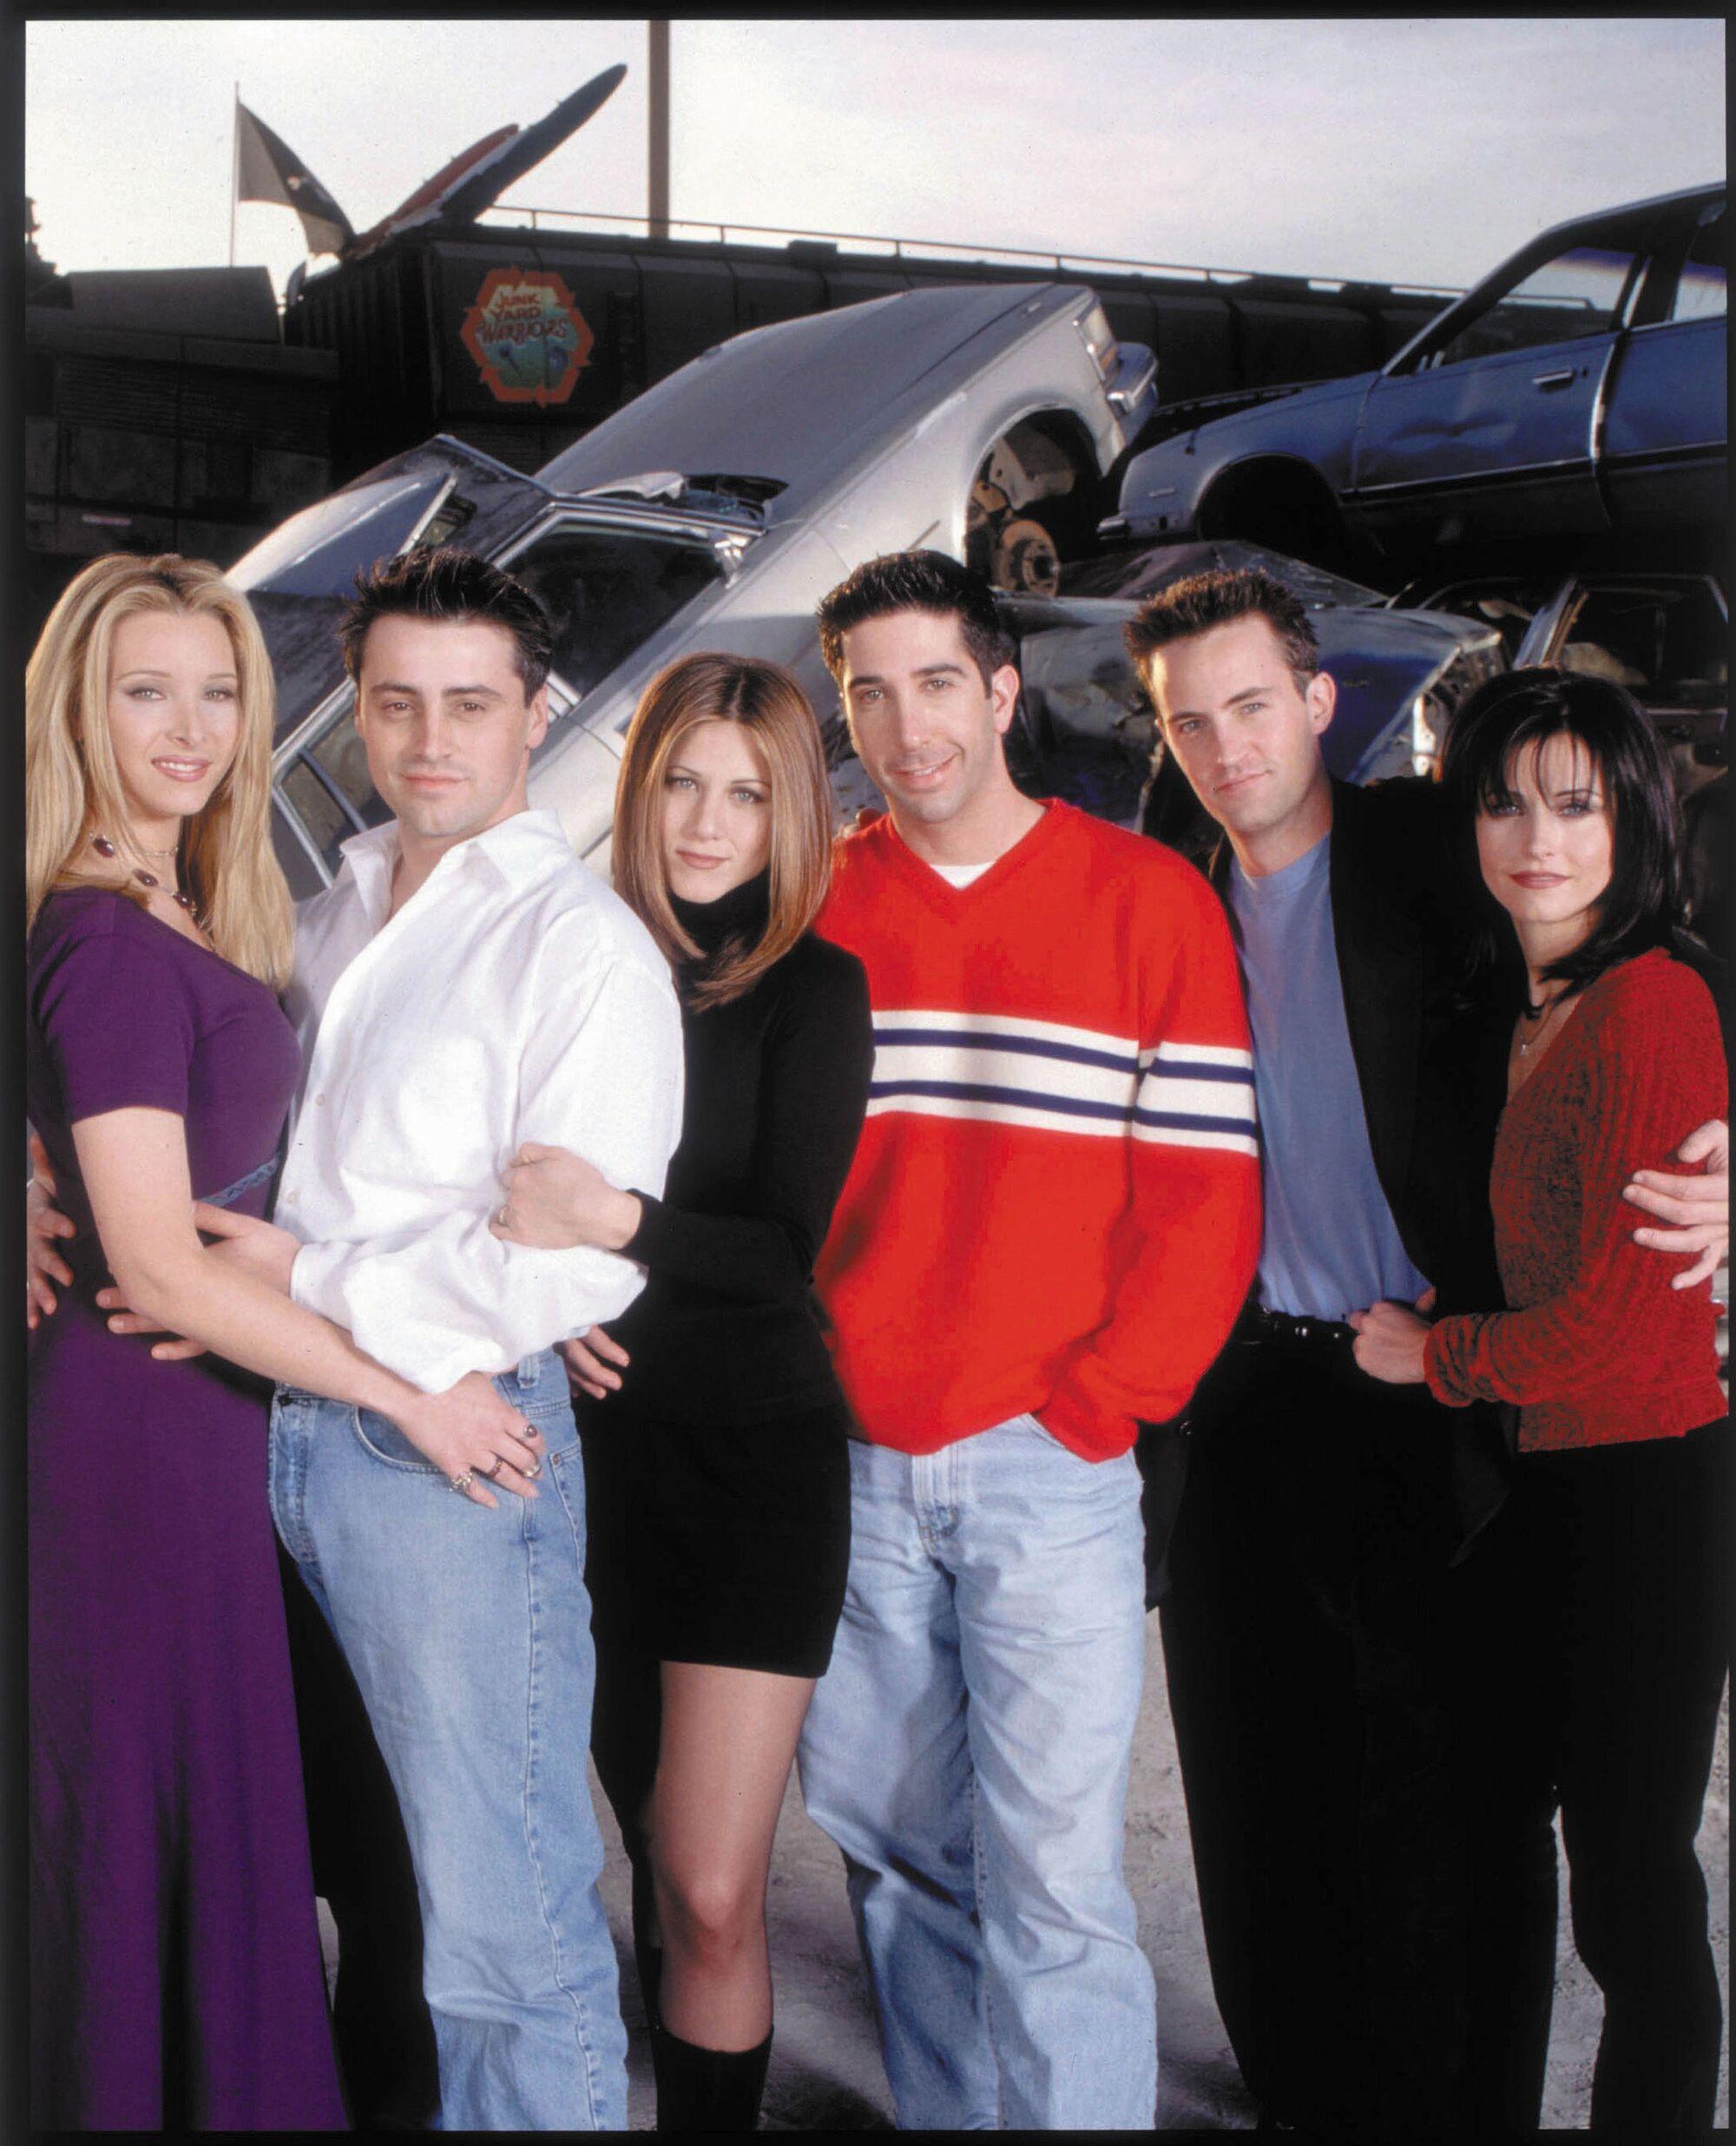 Friends season 8 episode 20 cast